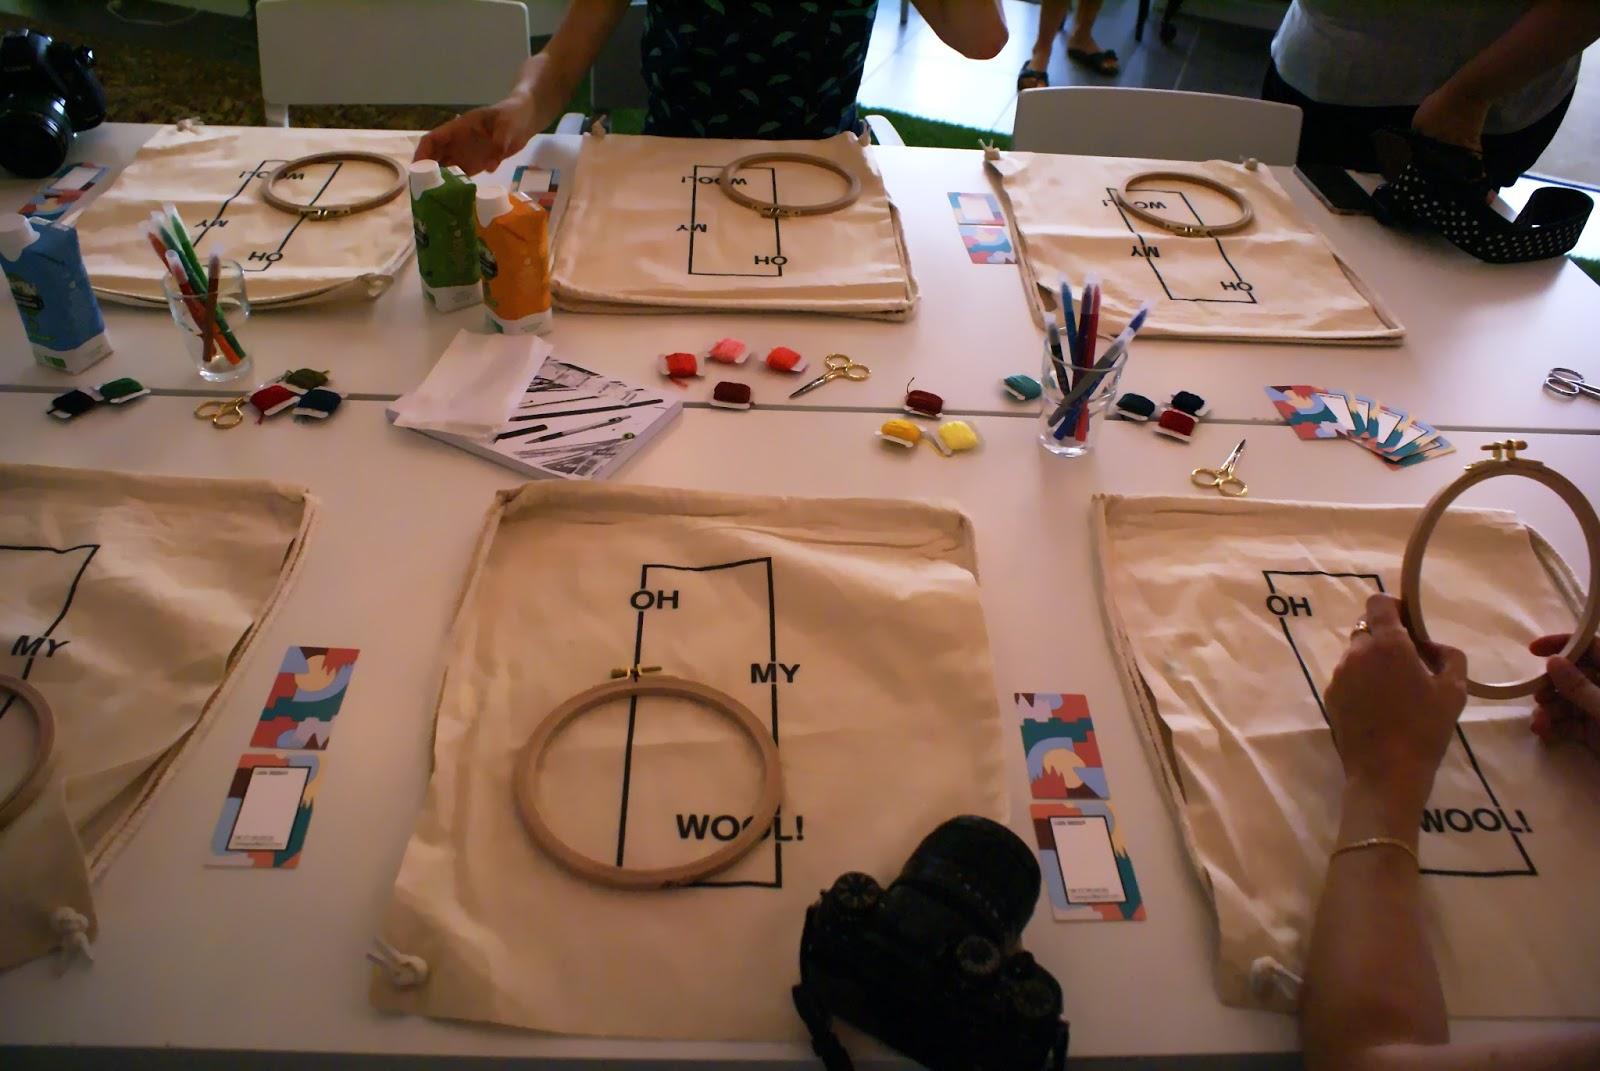 oh my wool lyon atelier broderie diy synbud blogtrip